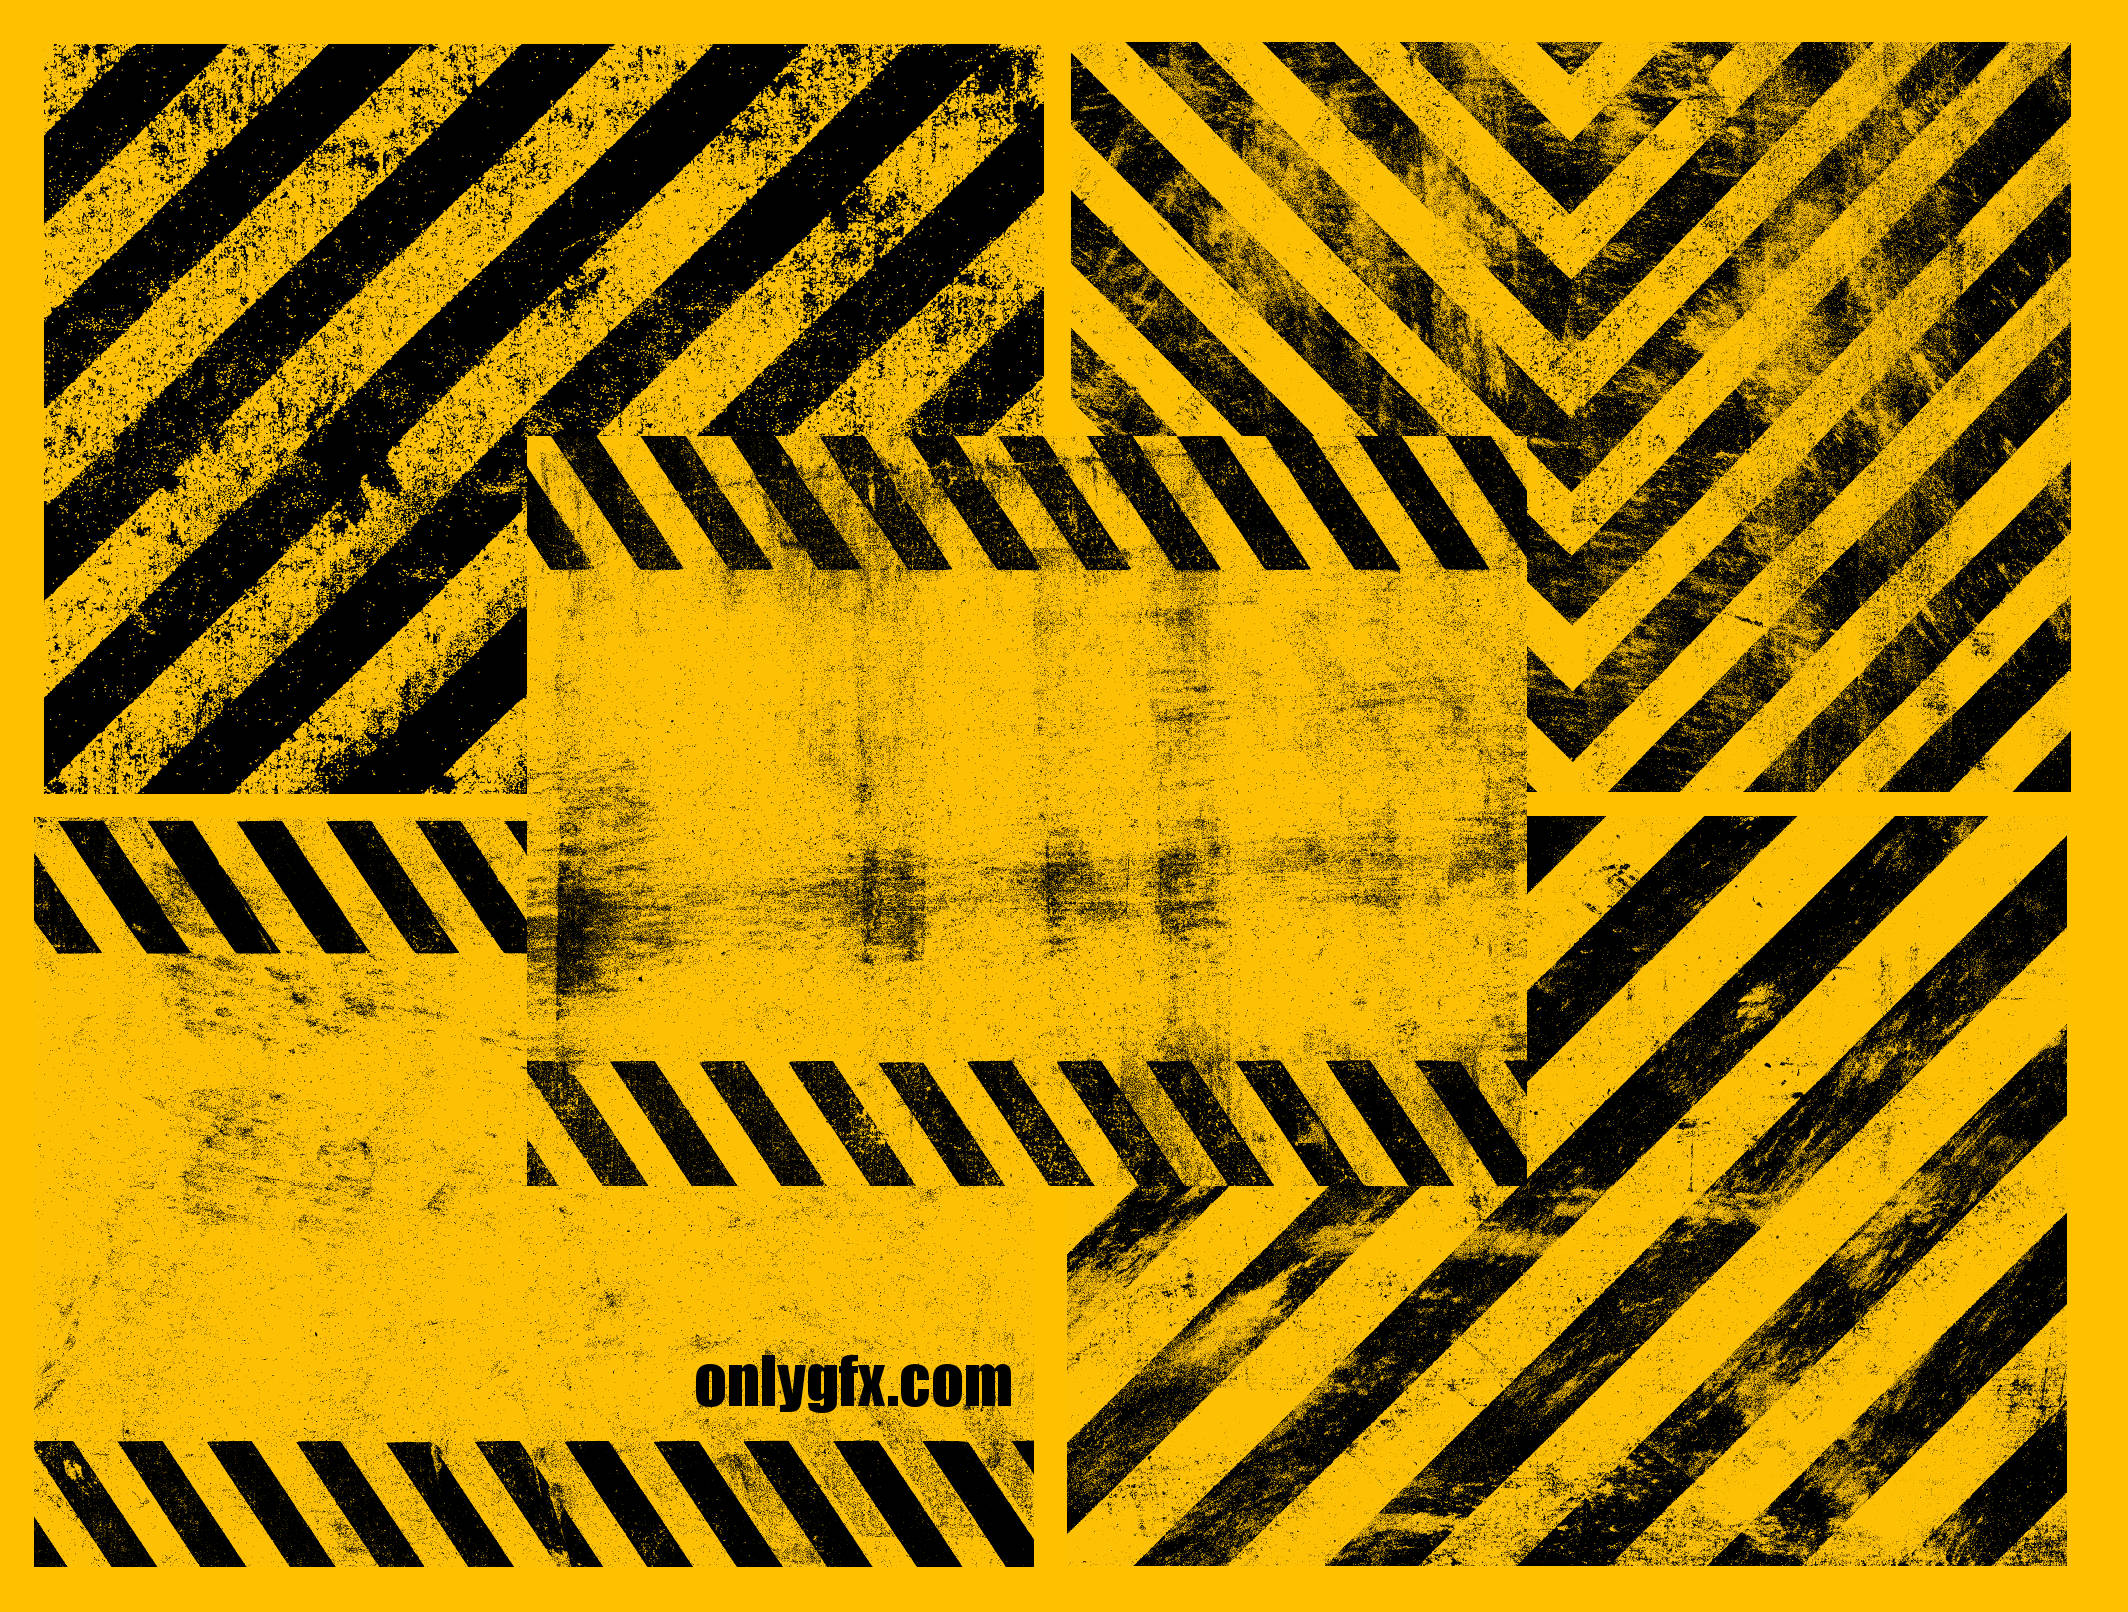 grunge-warning-line-background-cover.jpg